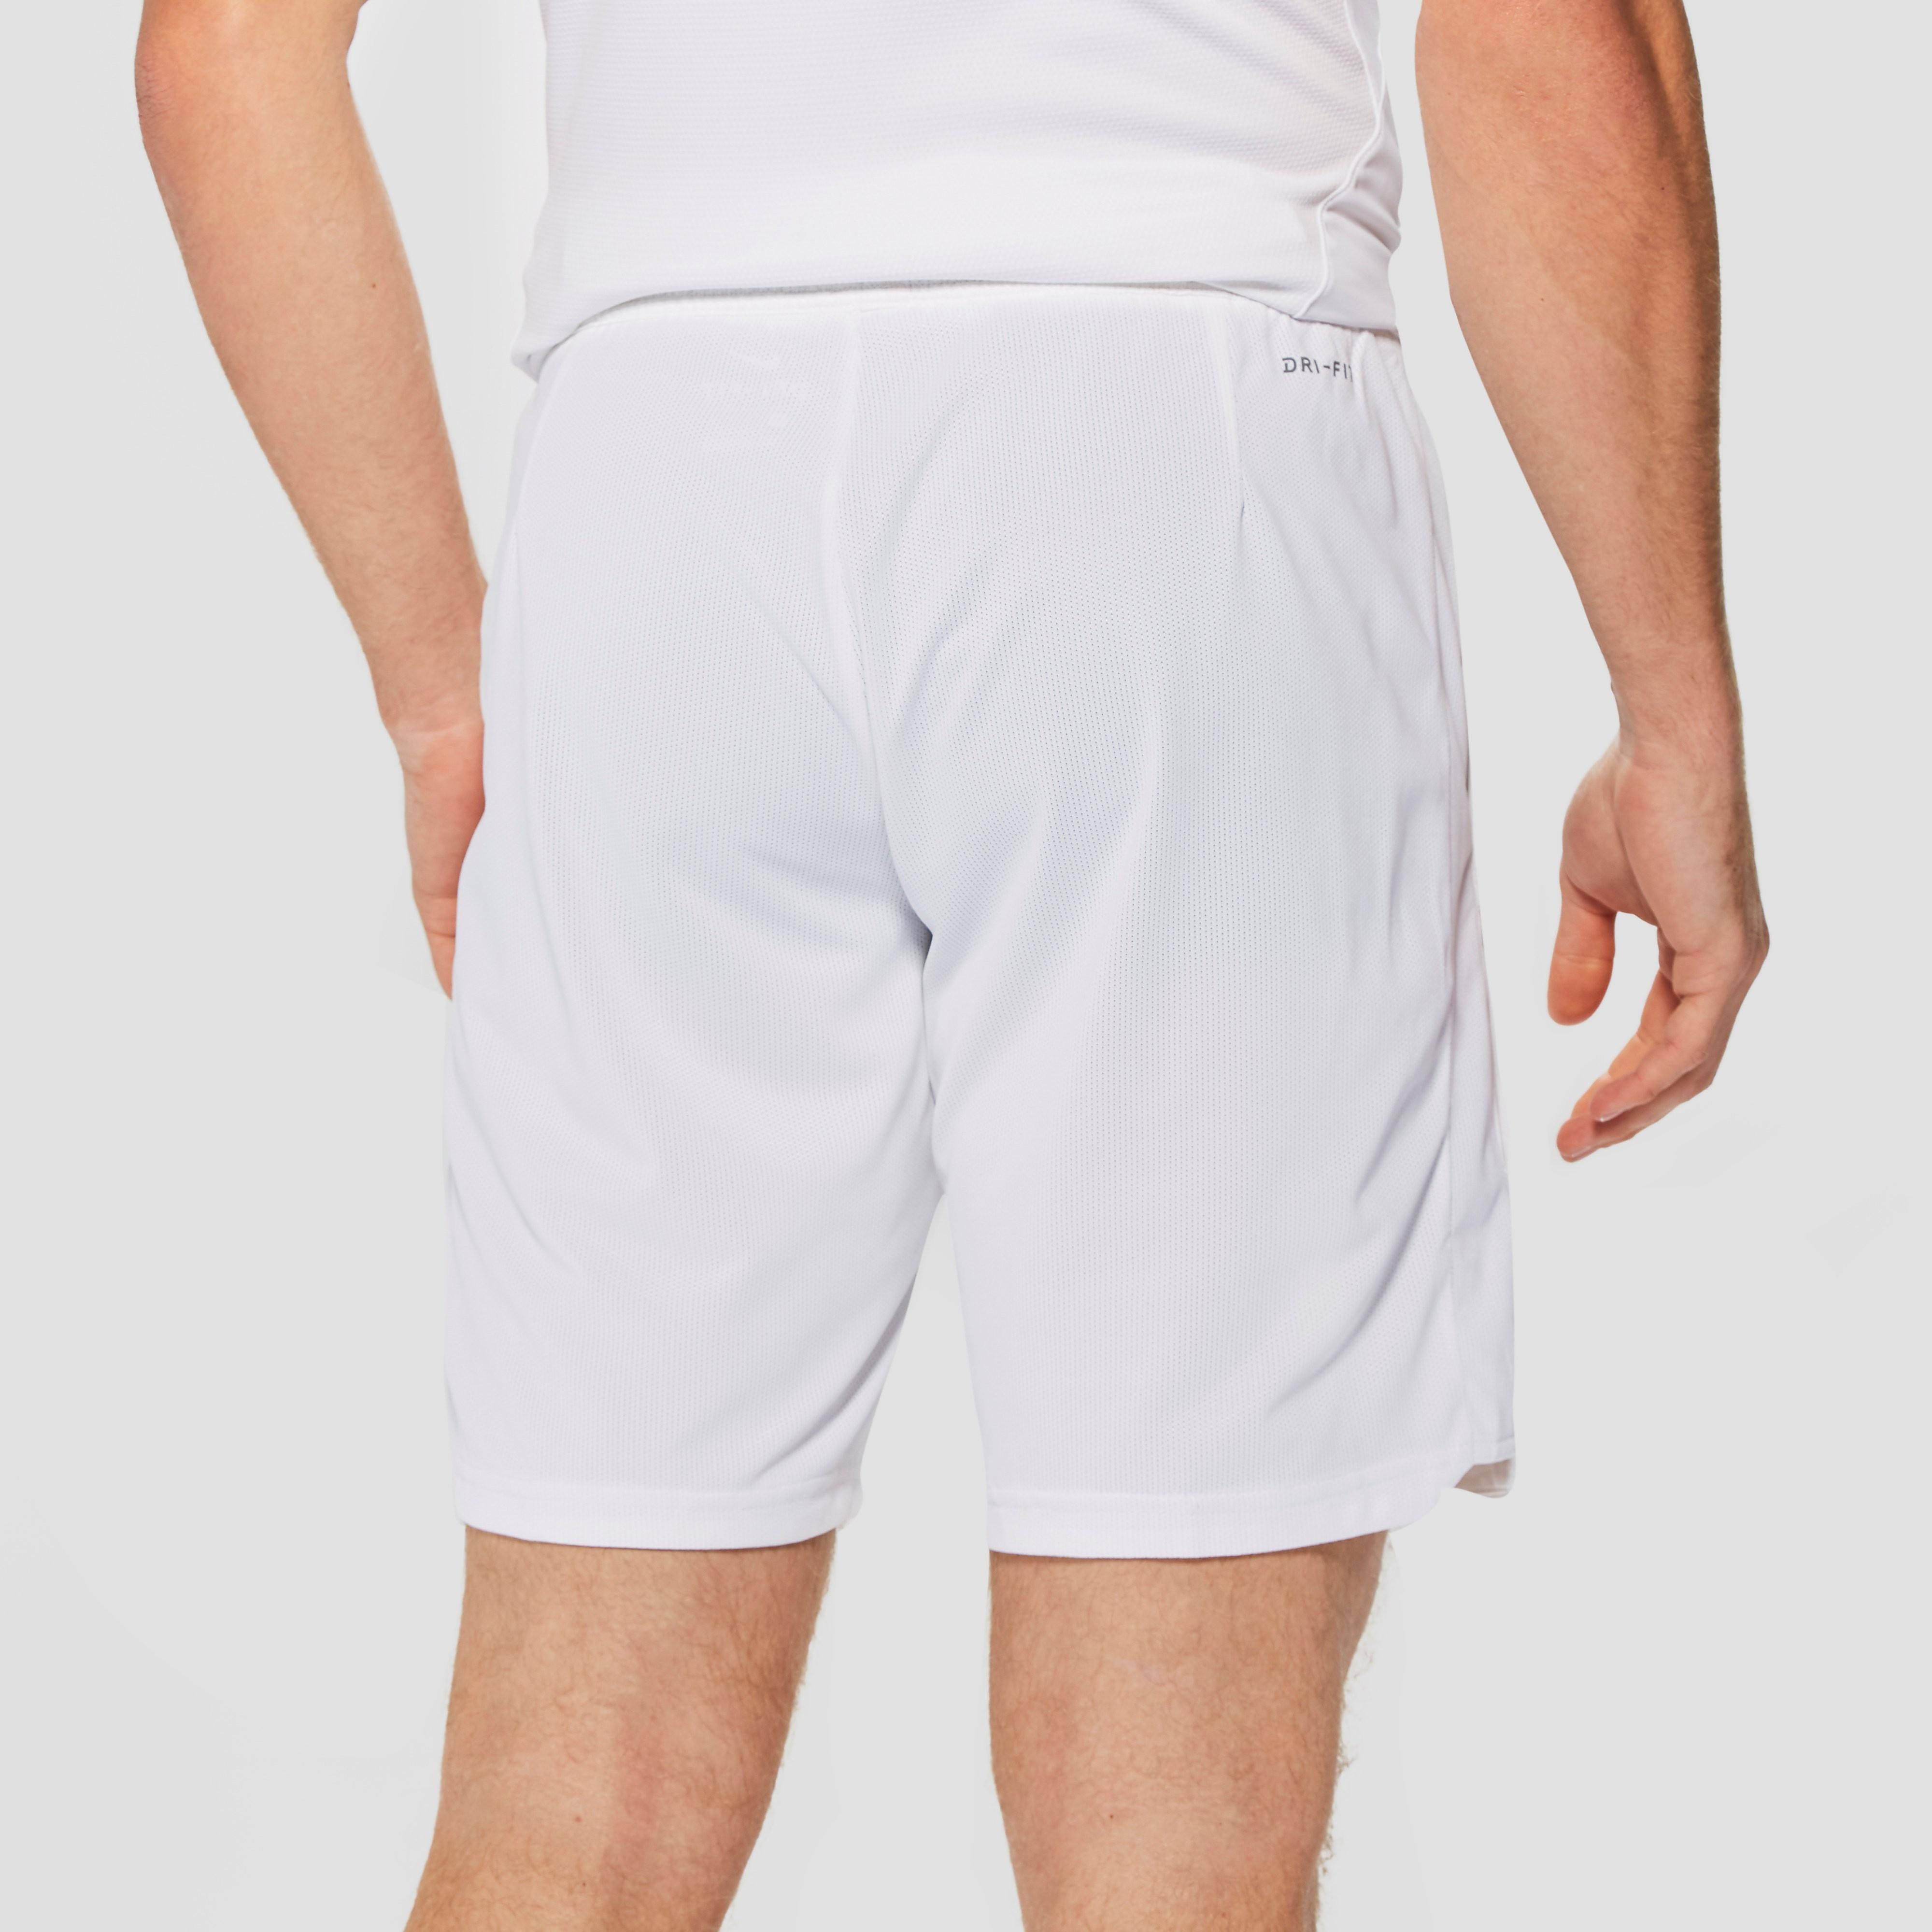 Nike NikeCourt Baseline Men's Tennis Shorts